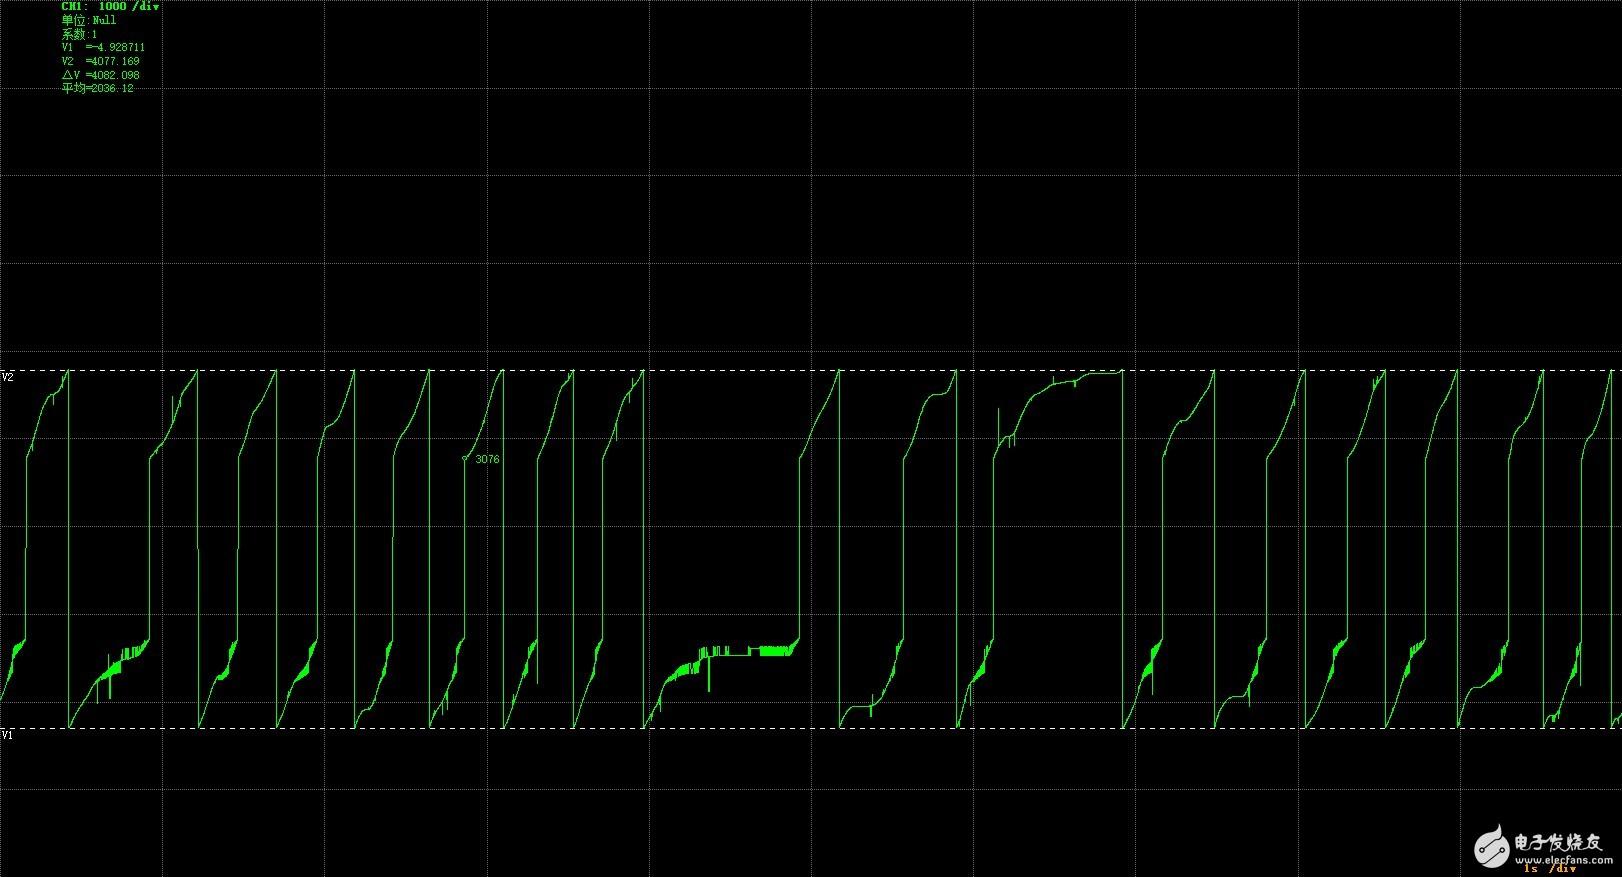 AD2S1205出现位置跳变的问题